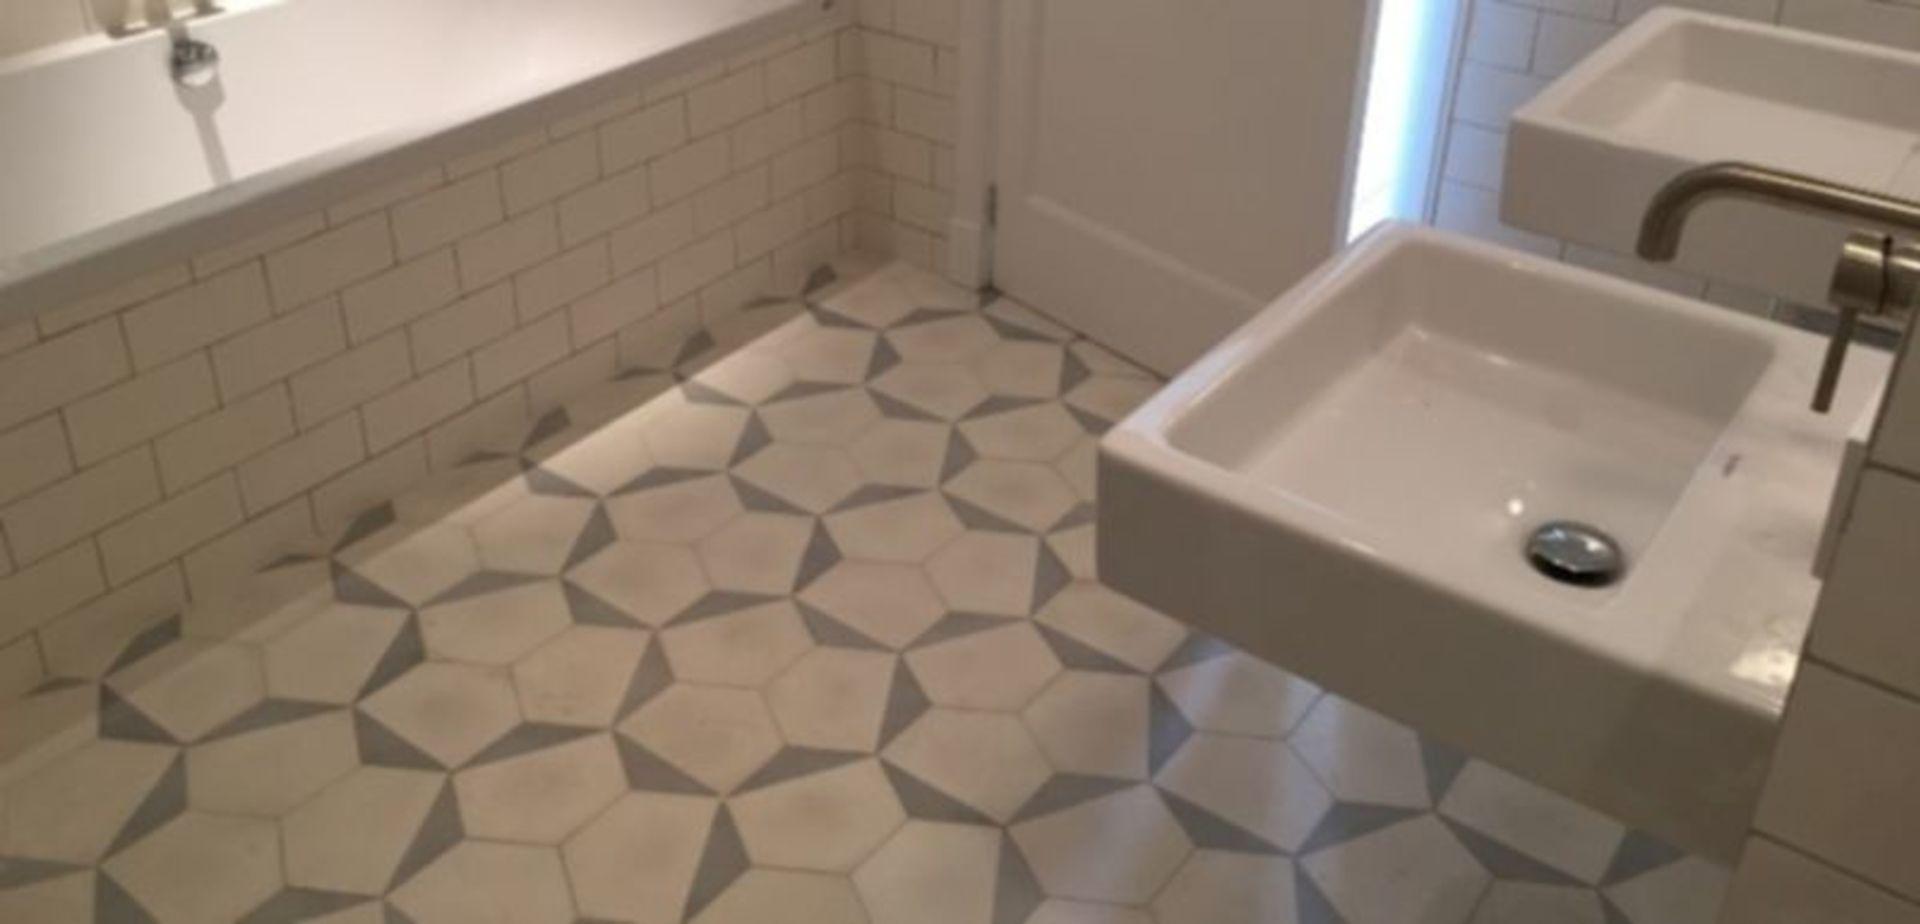 Badkamer Vloertegels 60x60.Tegels Kopen Vloertegels Badkamertegels Wandtegels Praxis